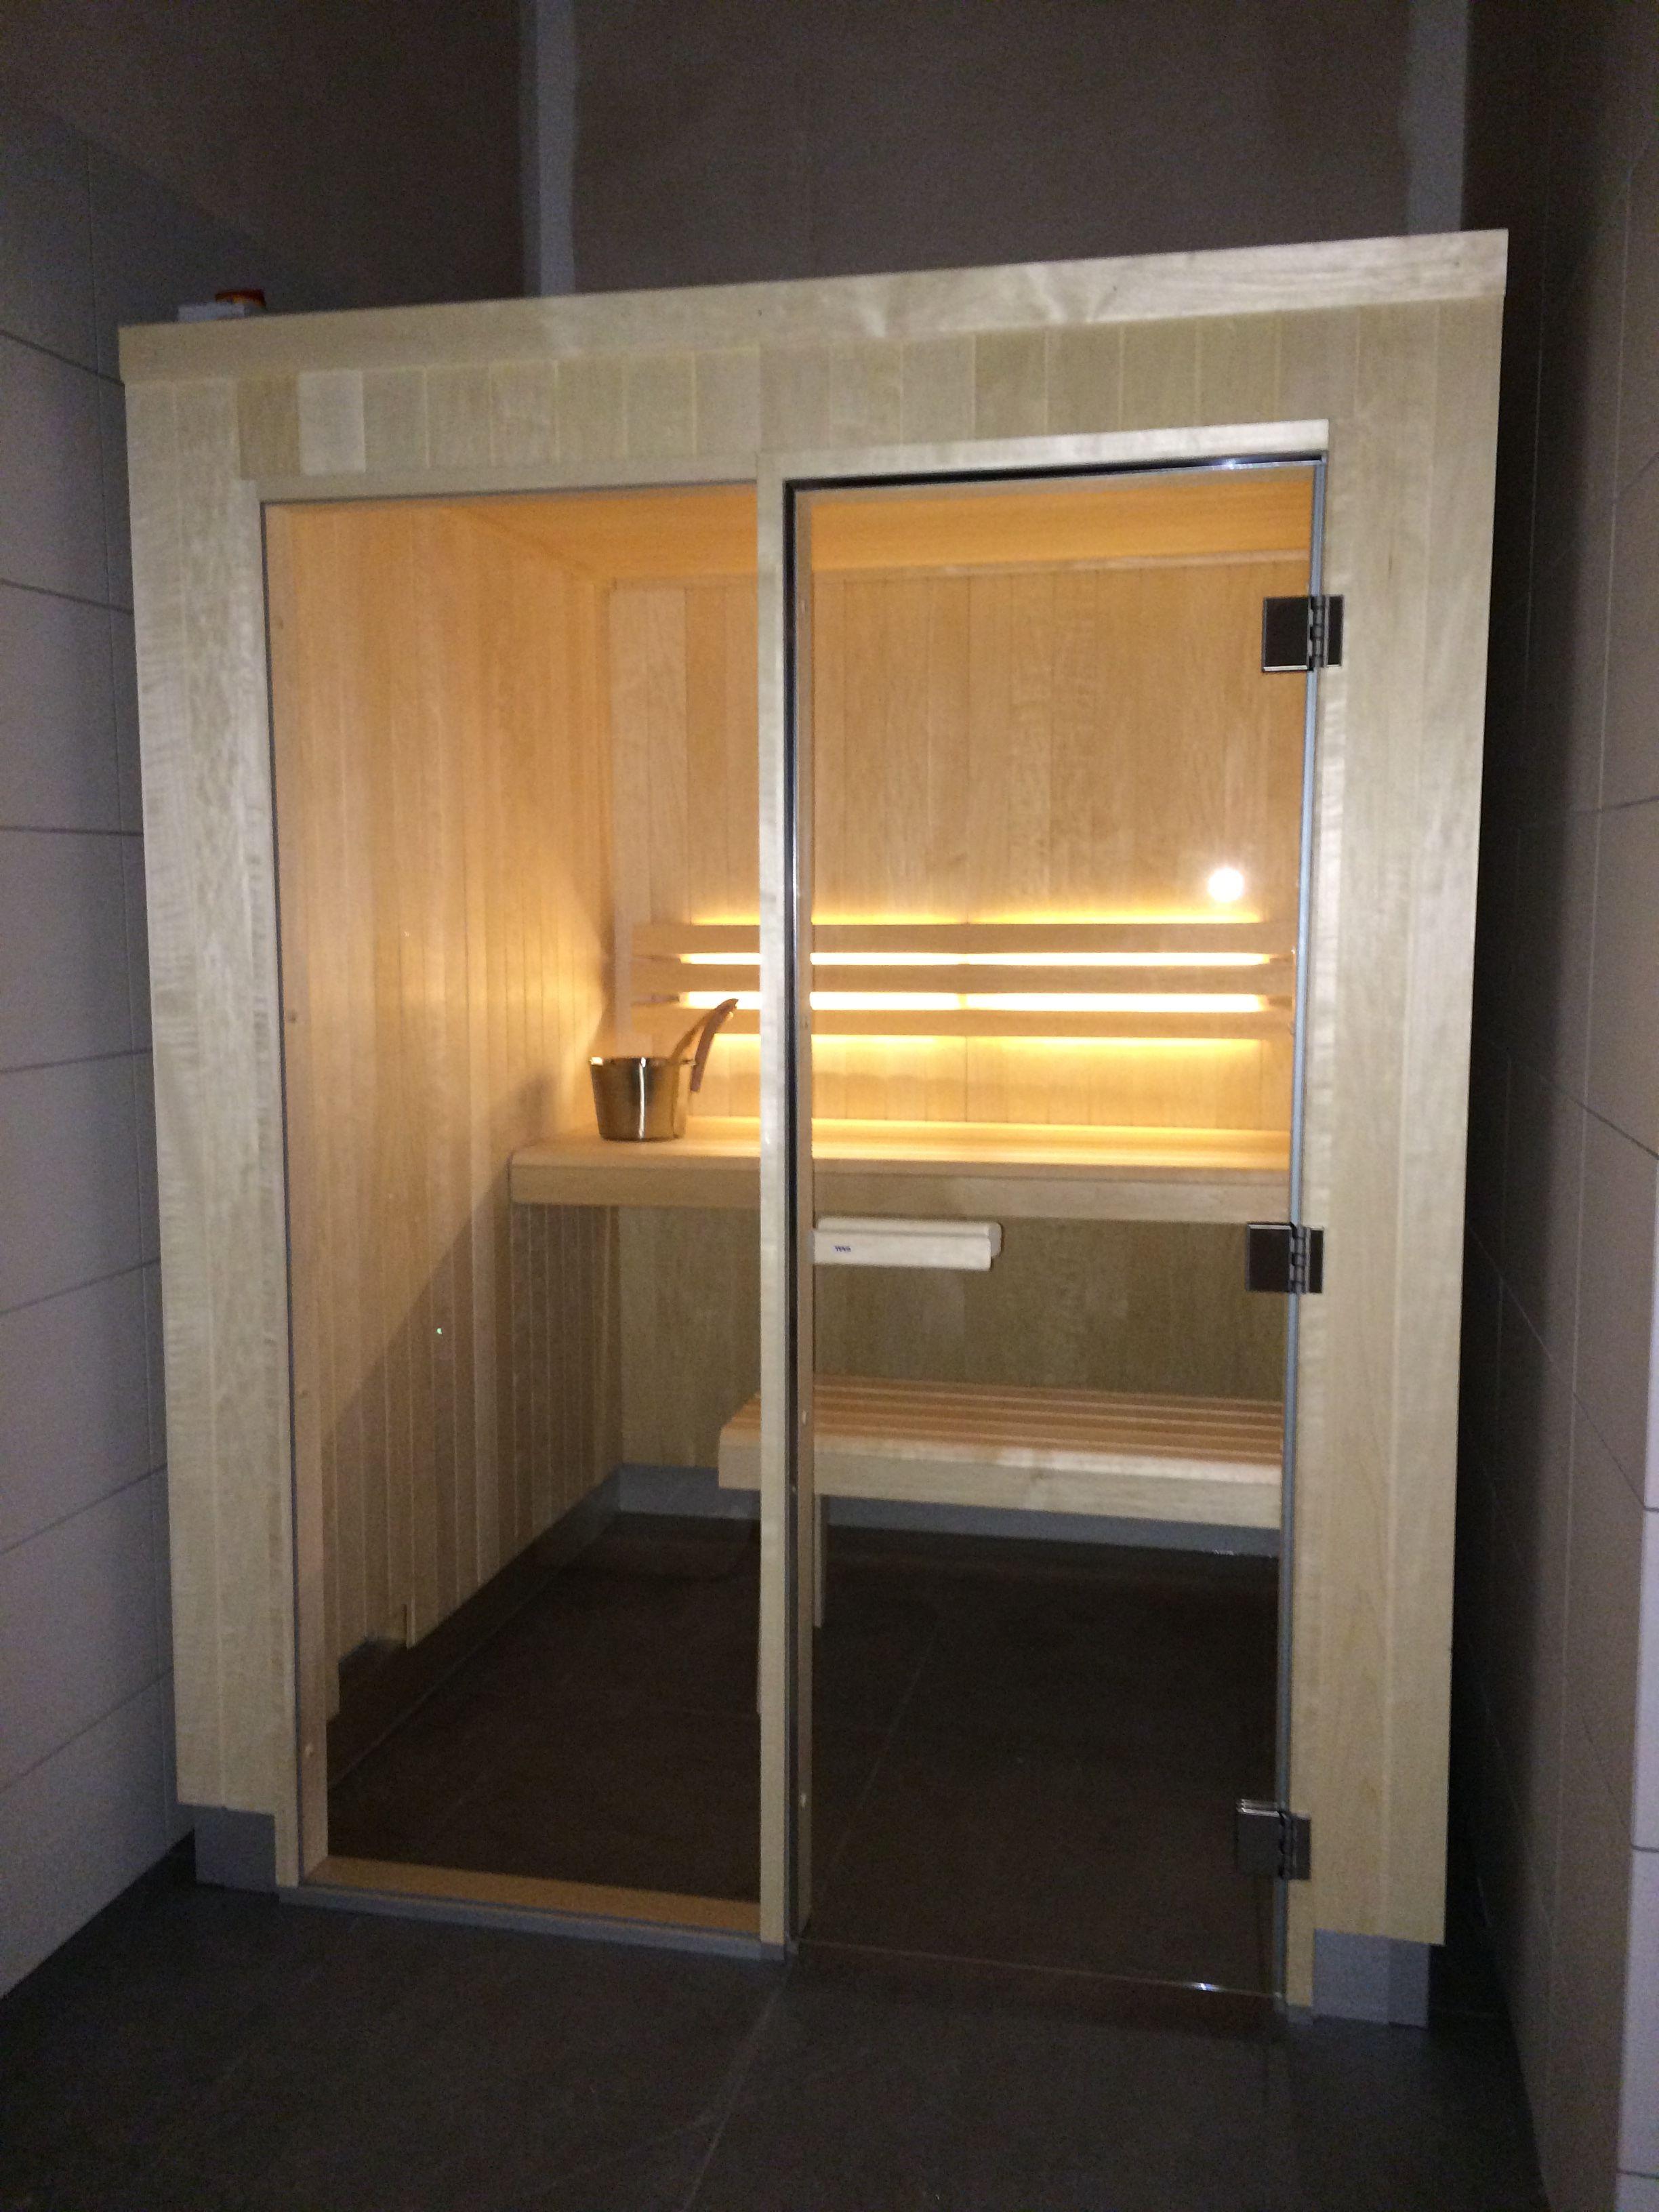 Tylo sauna evolve e1717 sauna and steam pinterest for Basement sauna kit